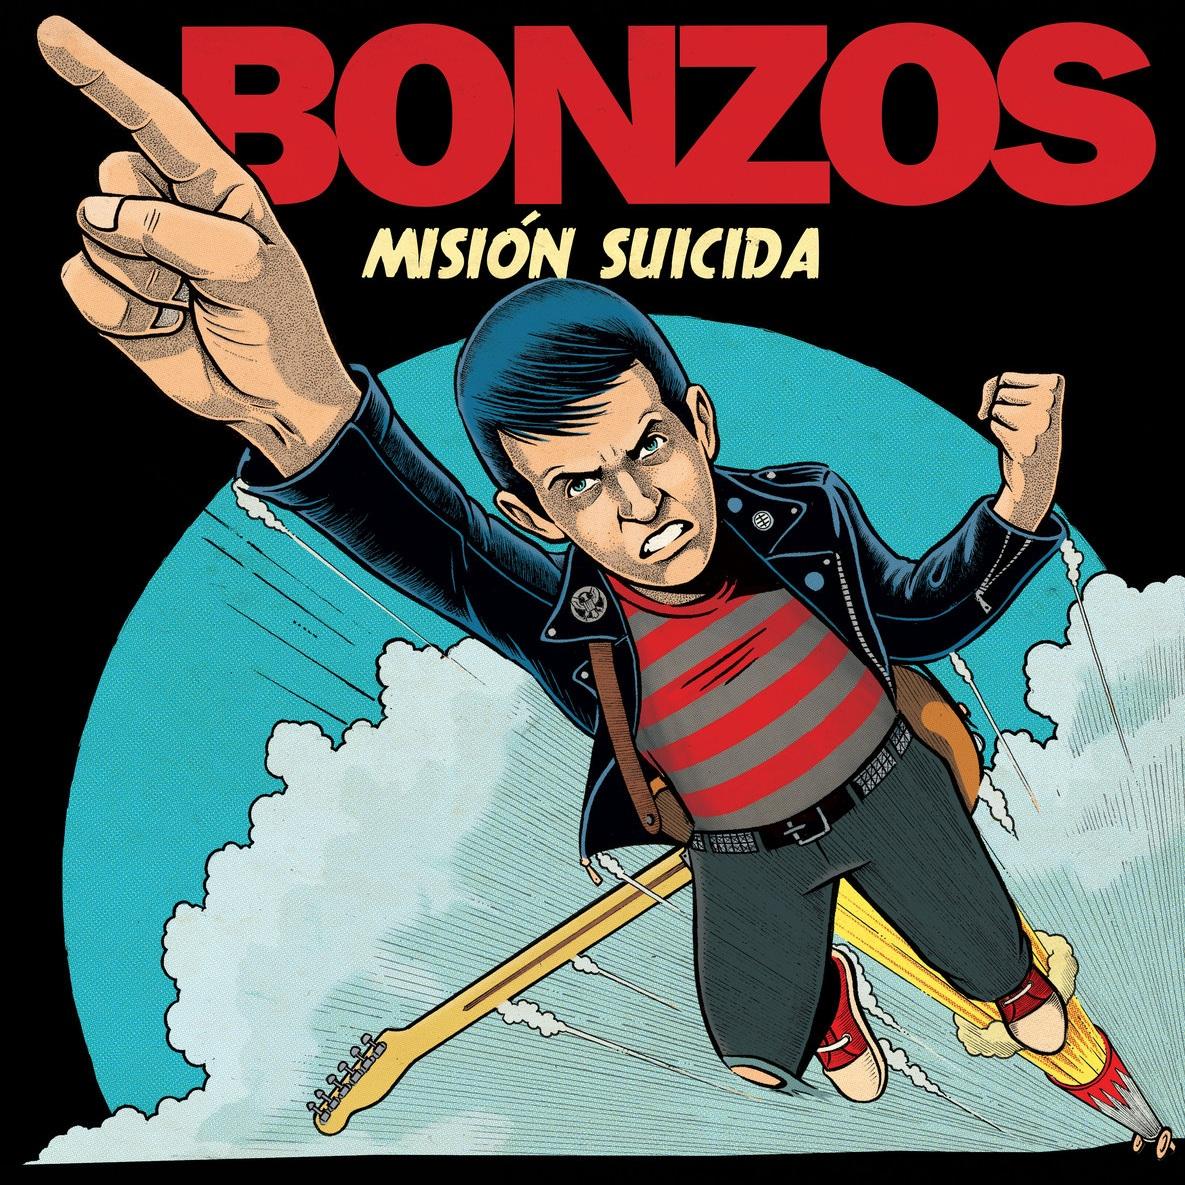 Bonzos - Mision Suicida - LP - Sept 2017